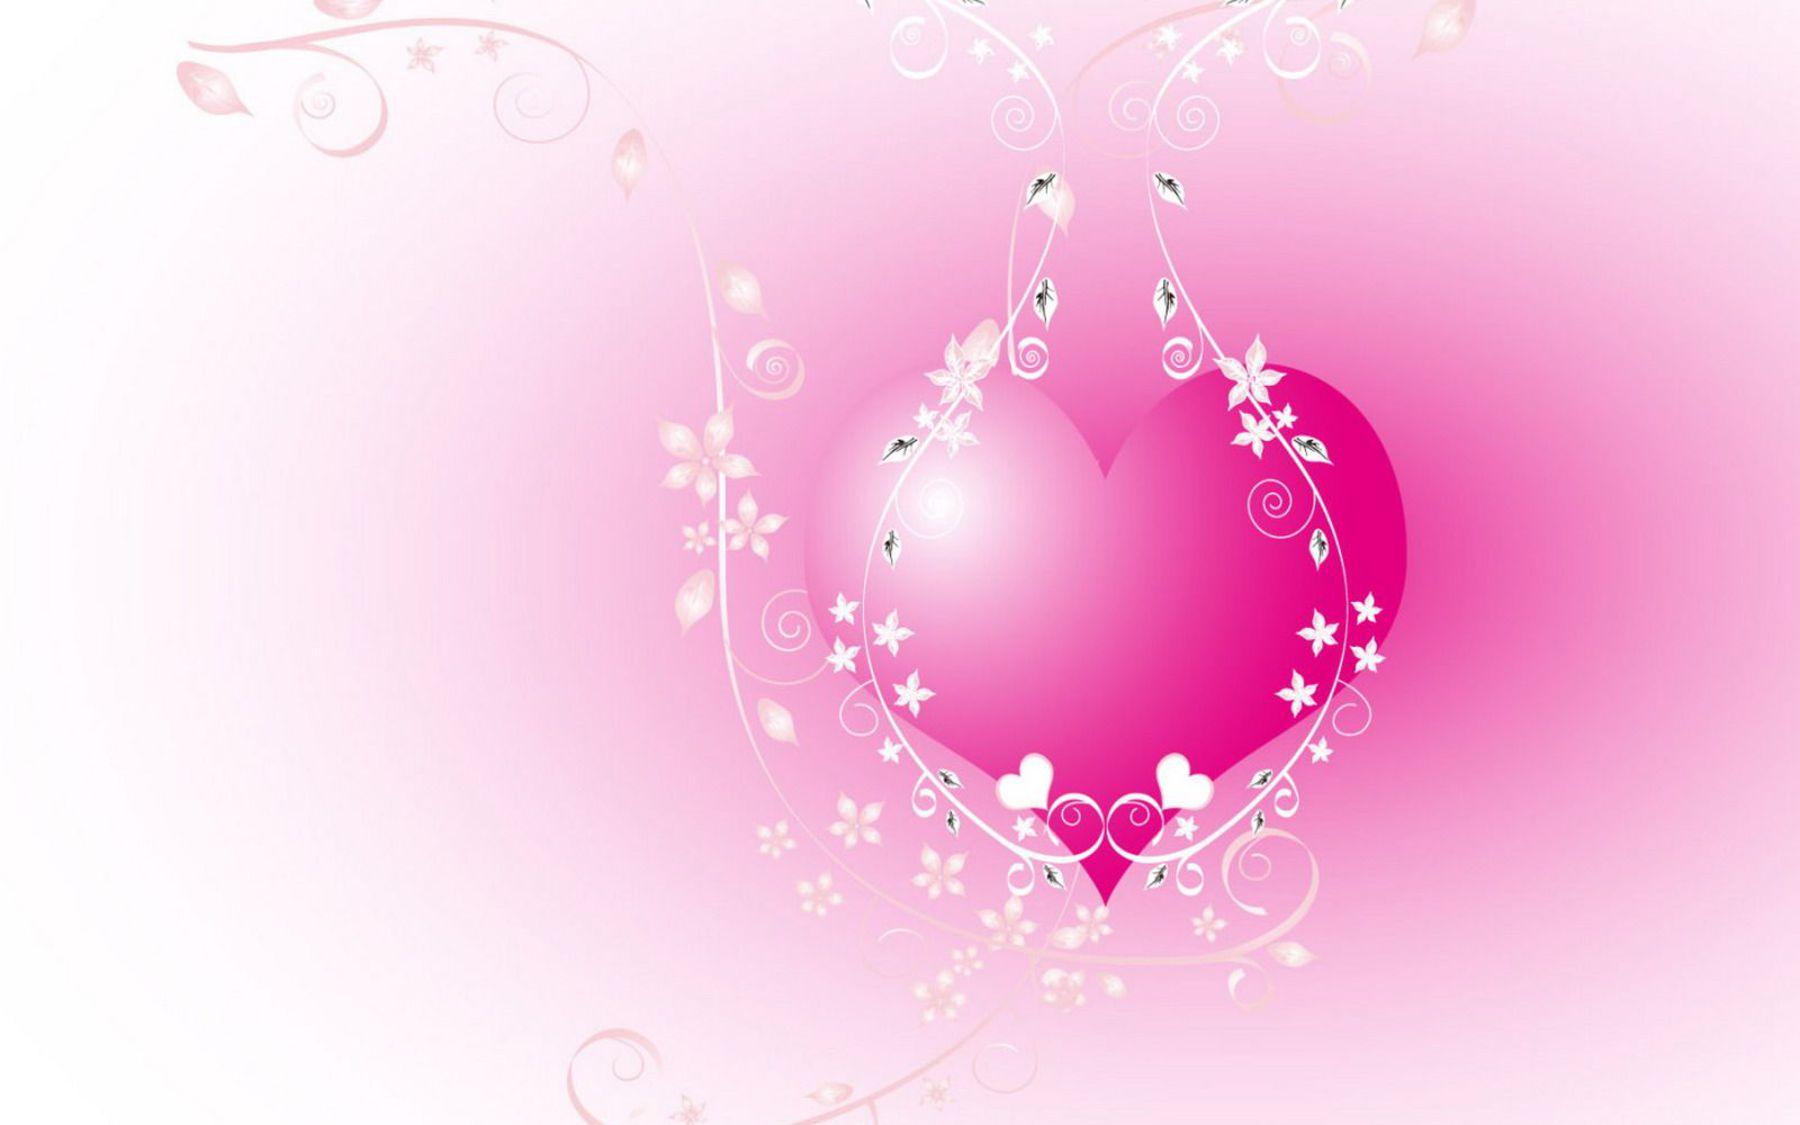 HD Wallpapers Charming 3D Valentines Day Heart Desktop Wallpaper 1800x1125